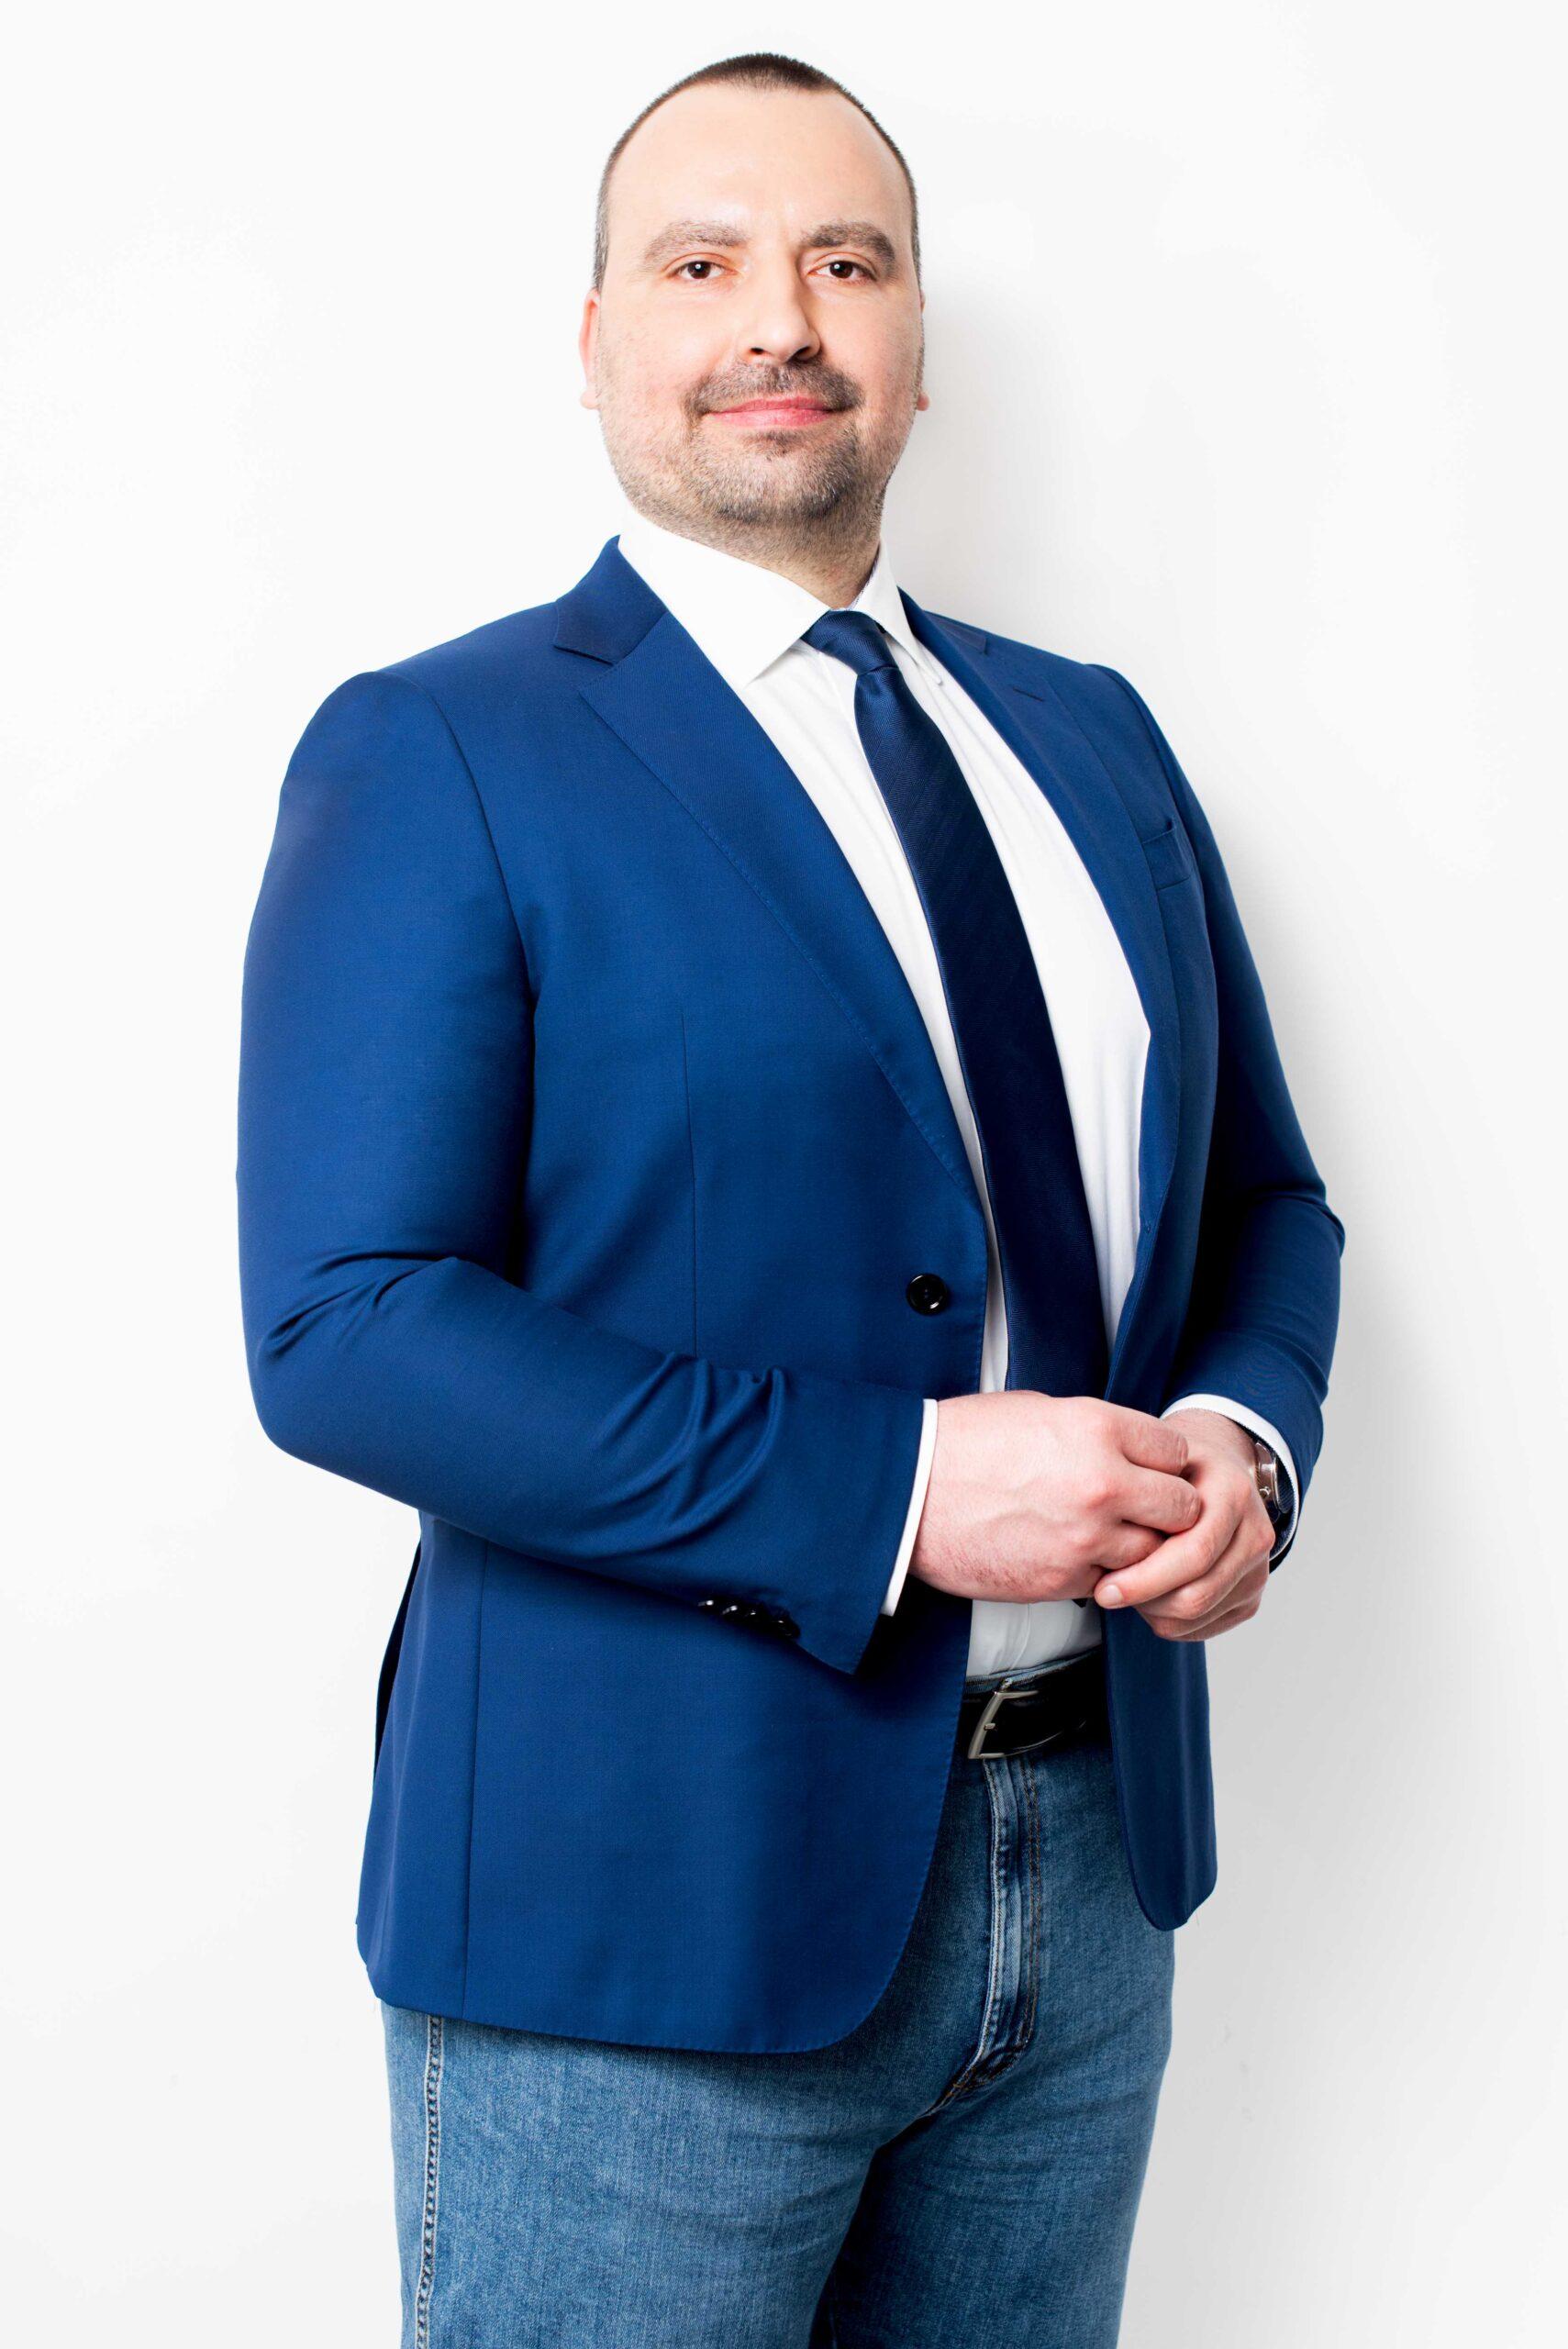 Jakub Fryc